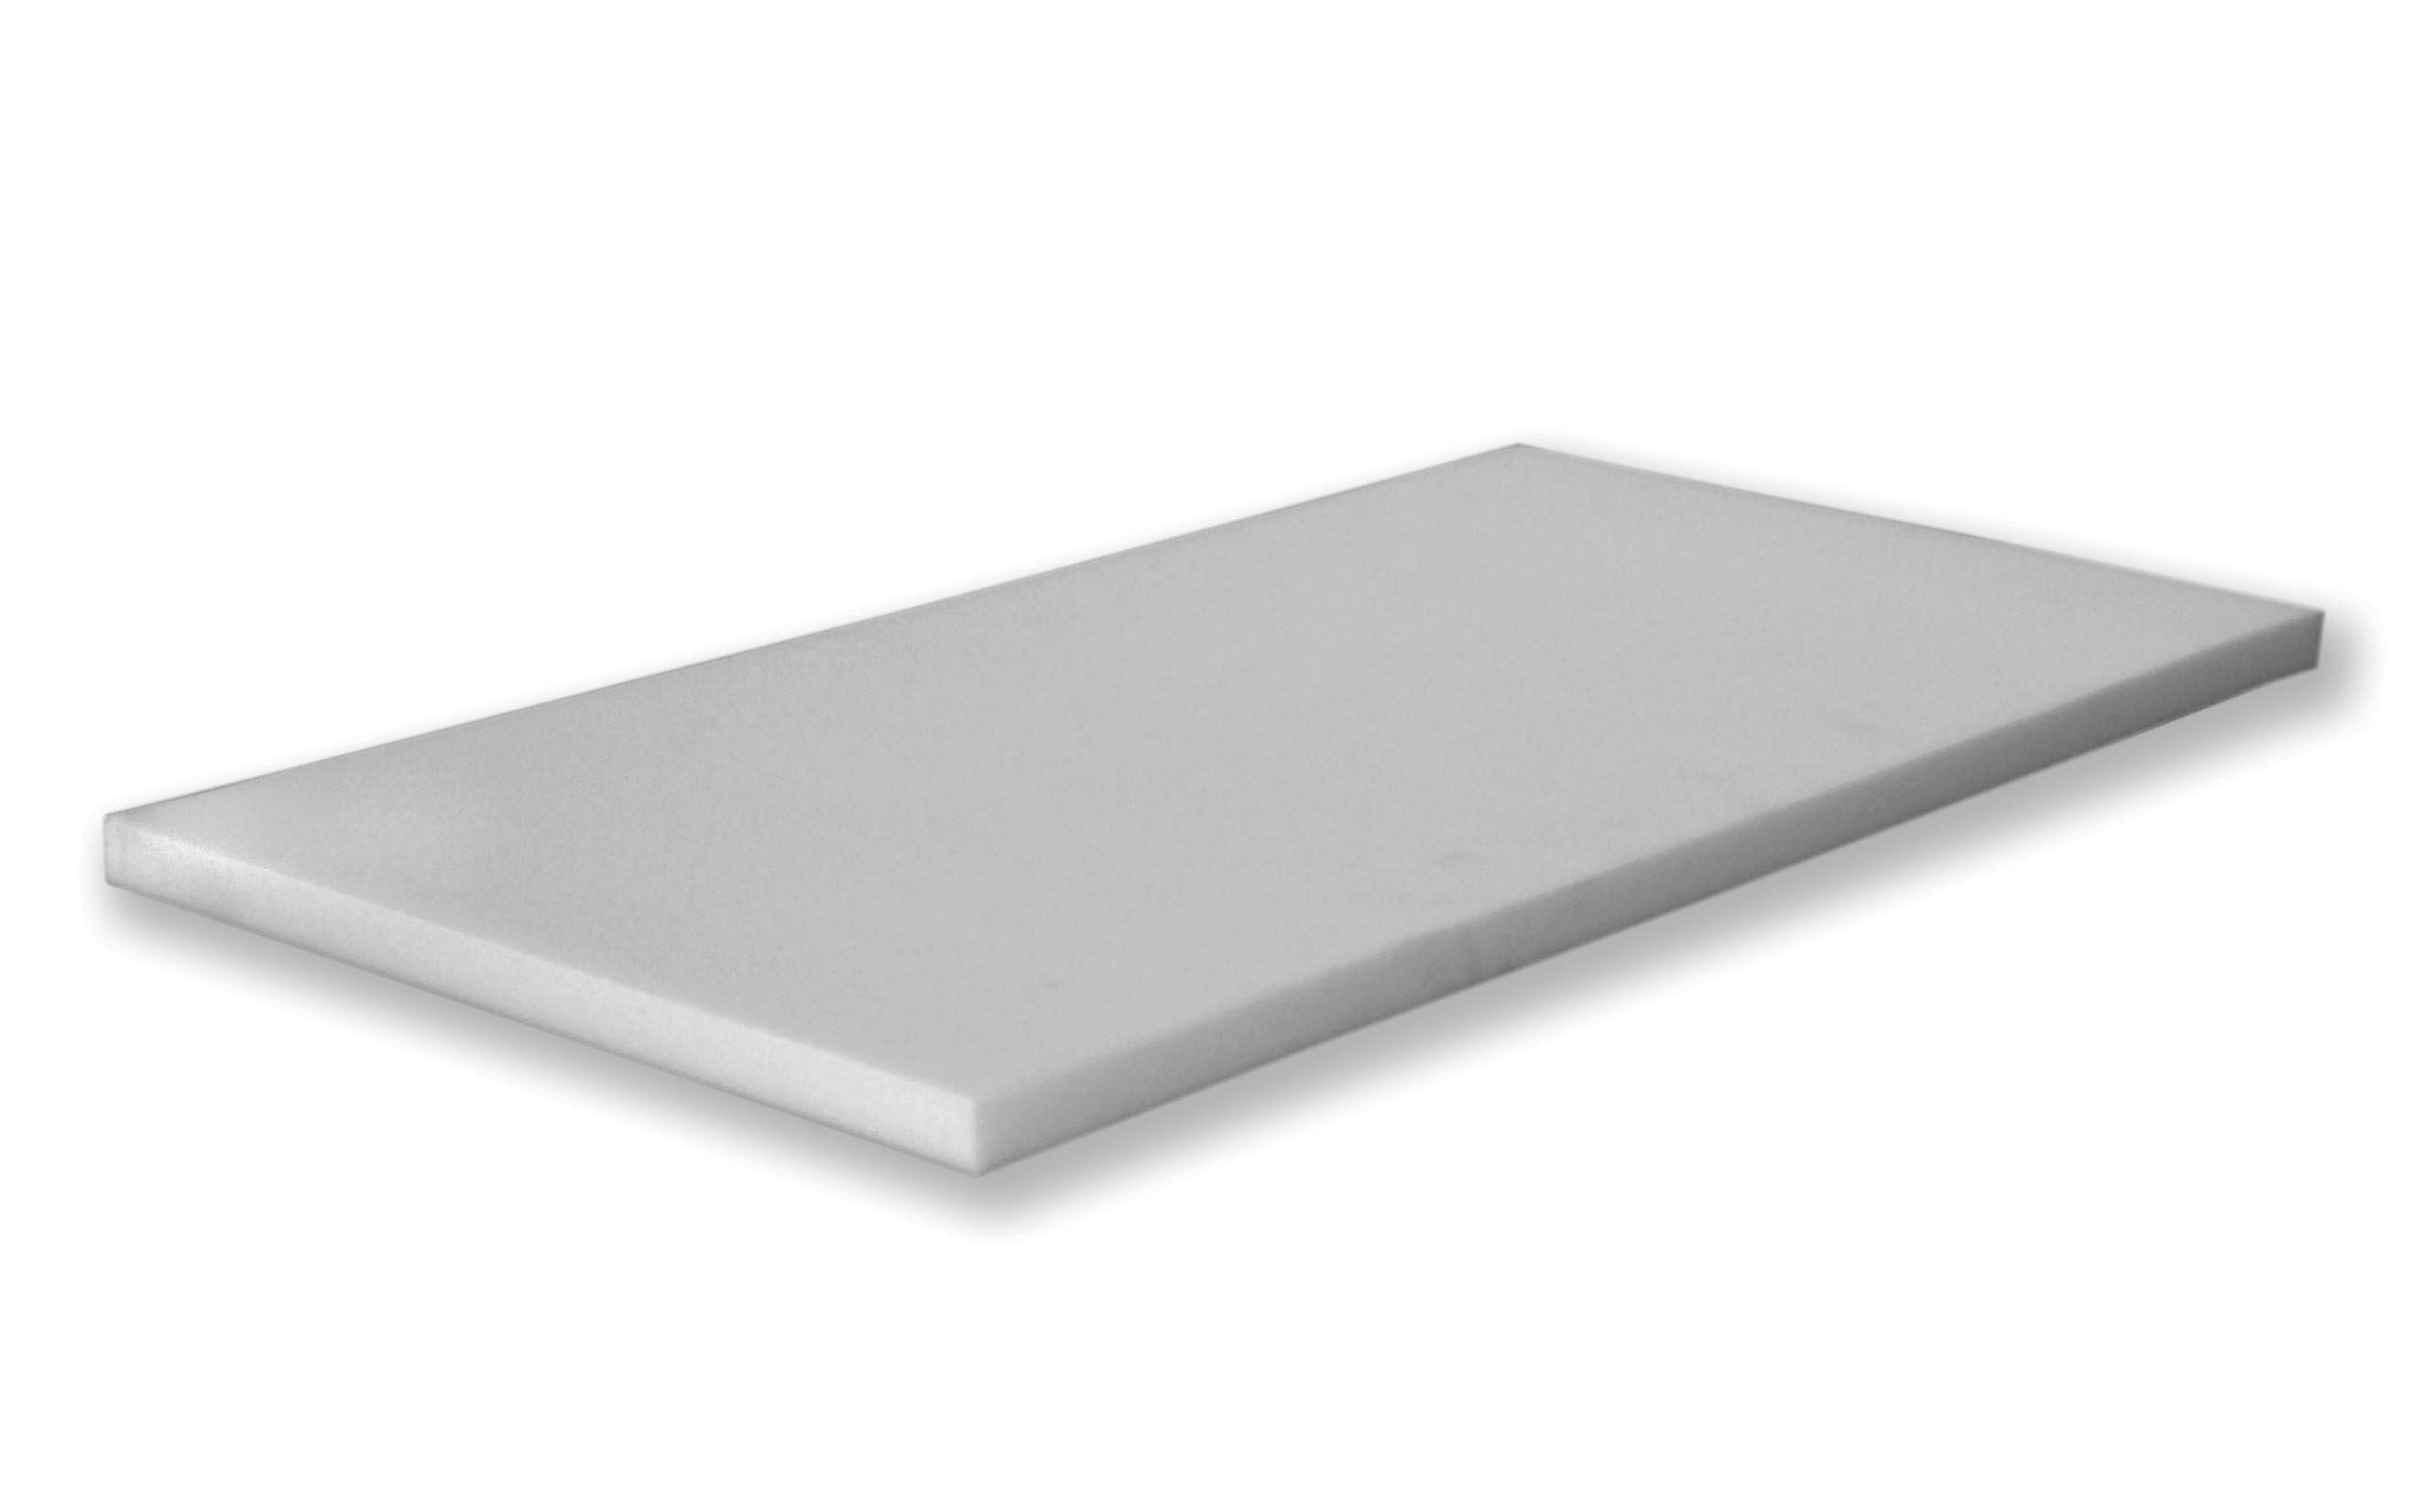 basotect platte 118x58x4cm schallabsorber wei grau. Black Bedroom Furniture Sets. Home Design Ideas